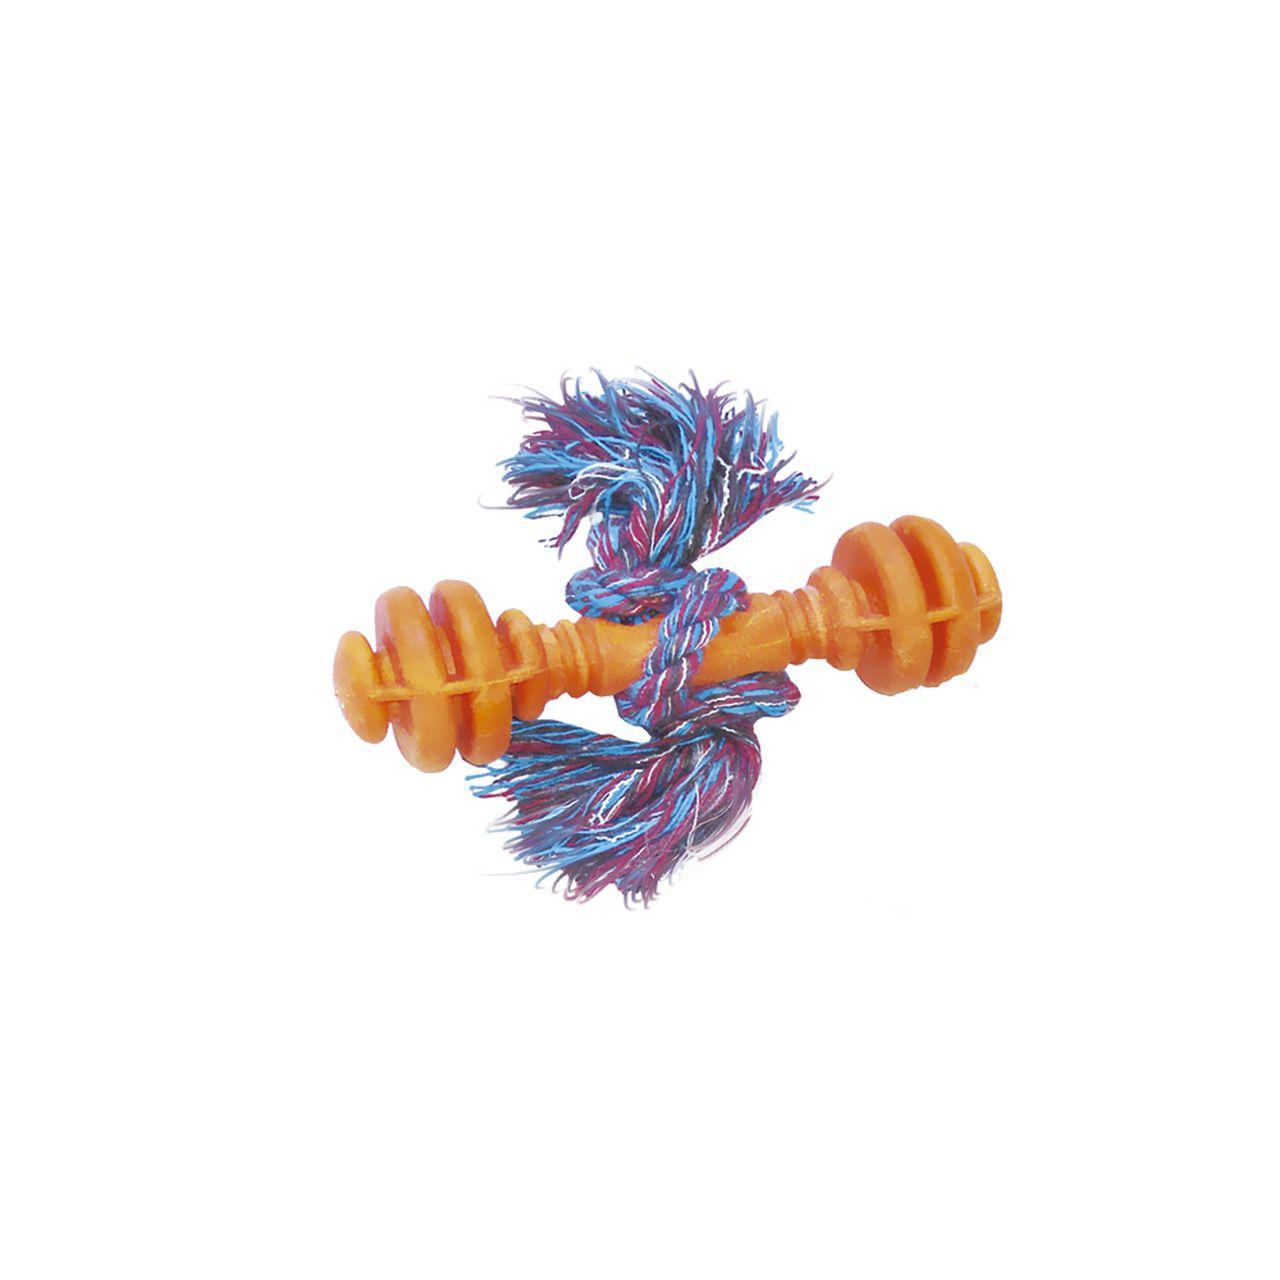 Brinquedo Furacão Pet Alteres Maciço de Borracha com Corda - Rosa